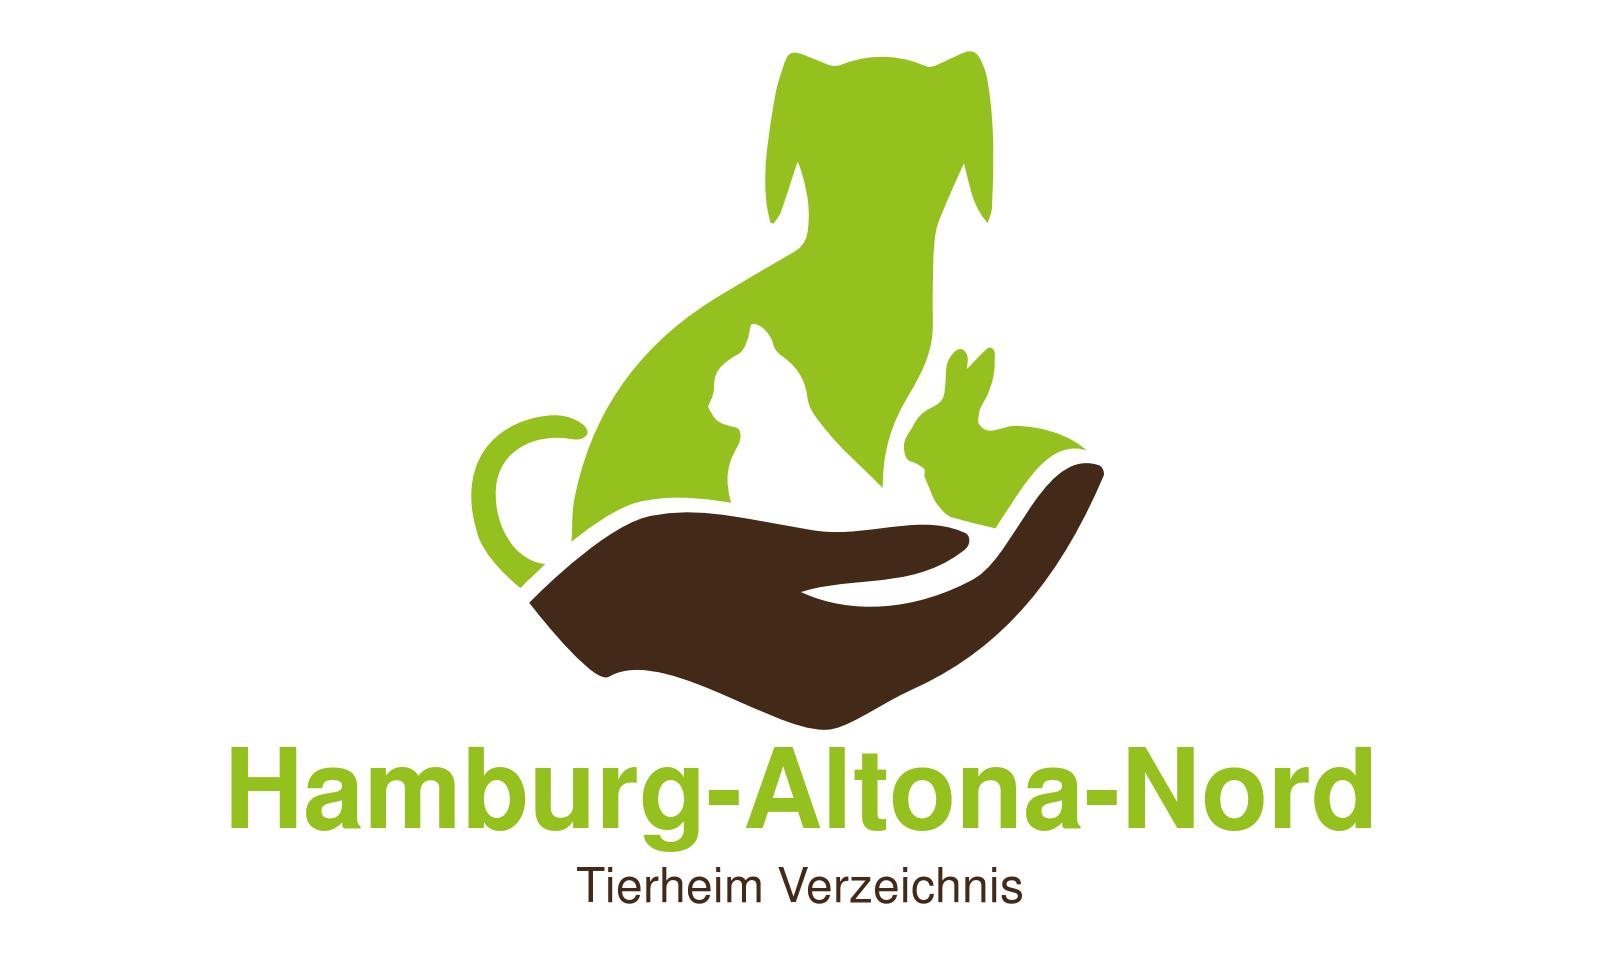 Tierheim Hamburg Altona-Nord